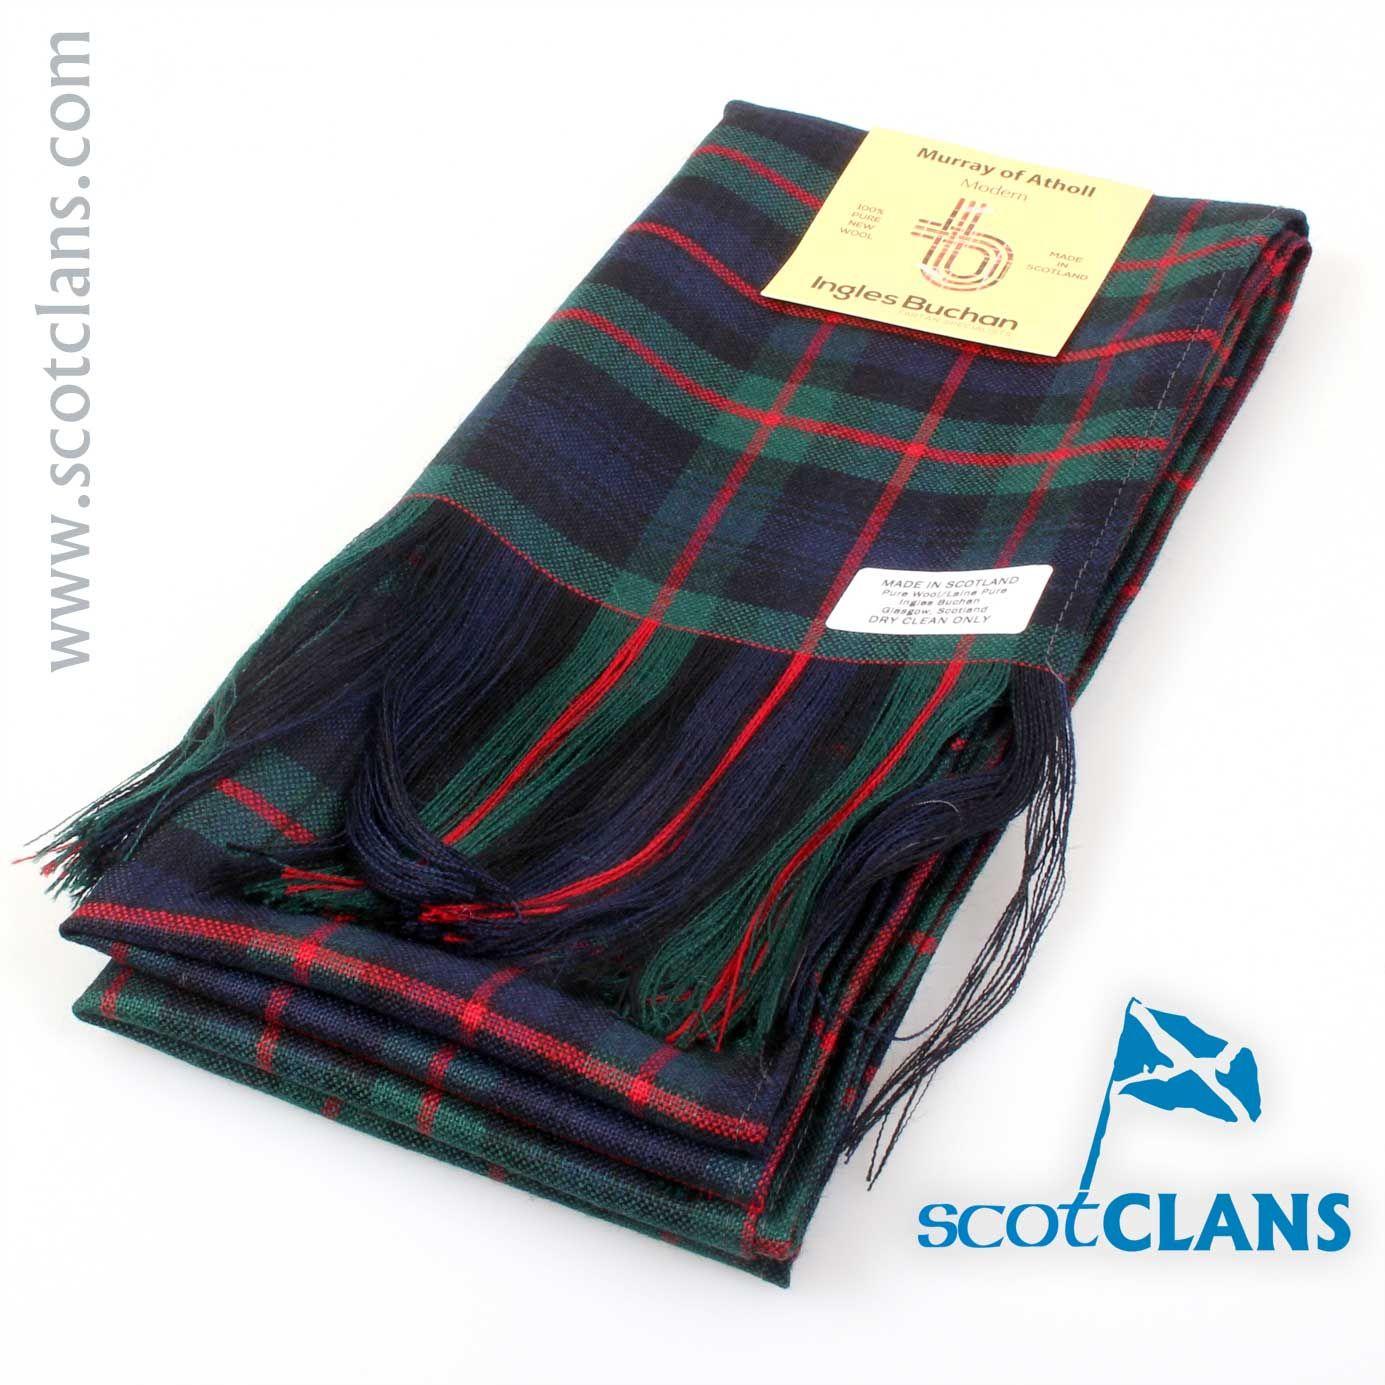 cff38bfec4cb Murray Modern Tartan Sash. Free Worldwide Shipping Available | Clan ...